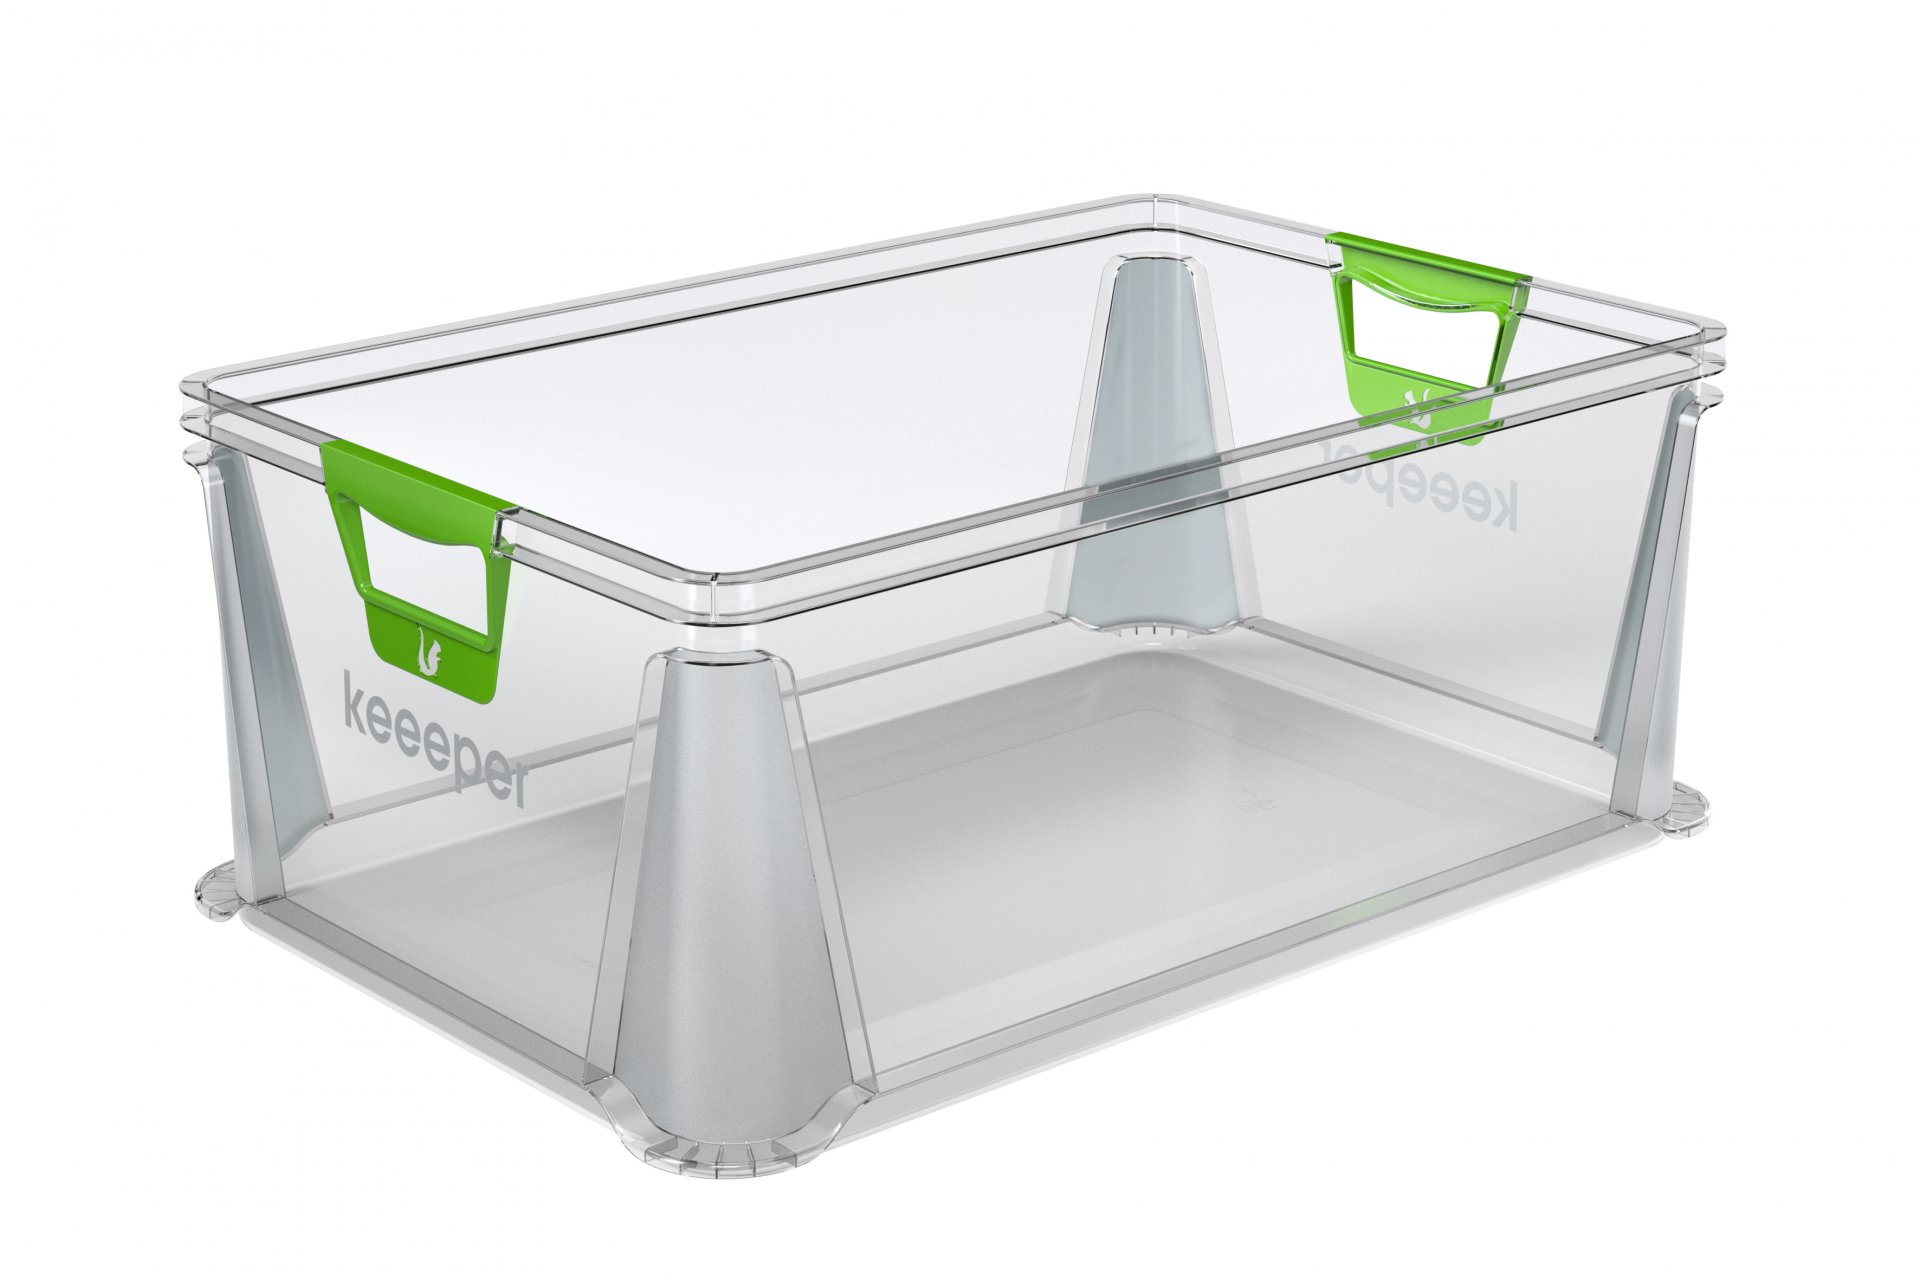 Keeeper Eurobox s měkkými úchyty luis, transparentní 45L